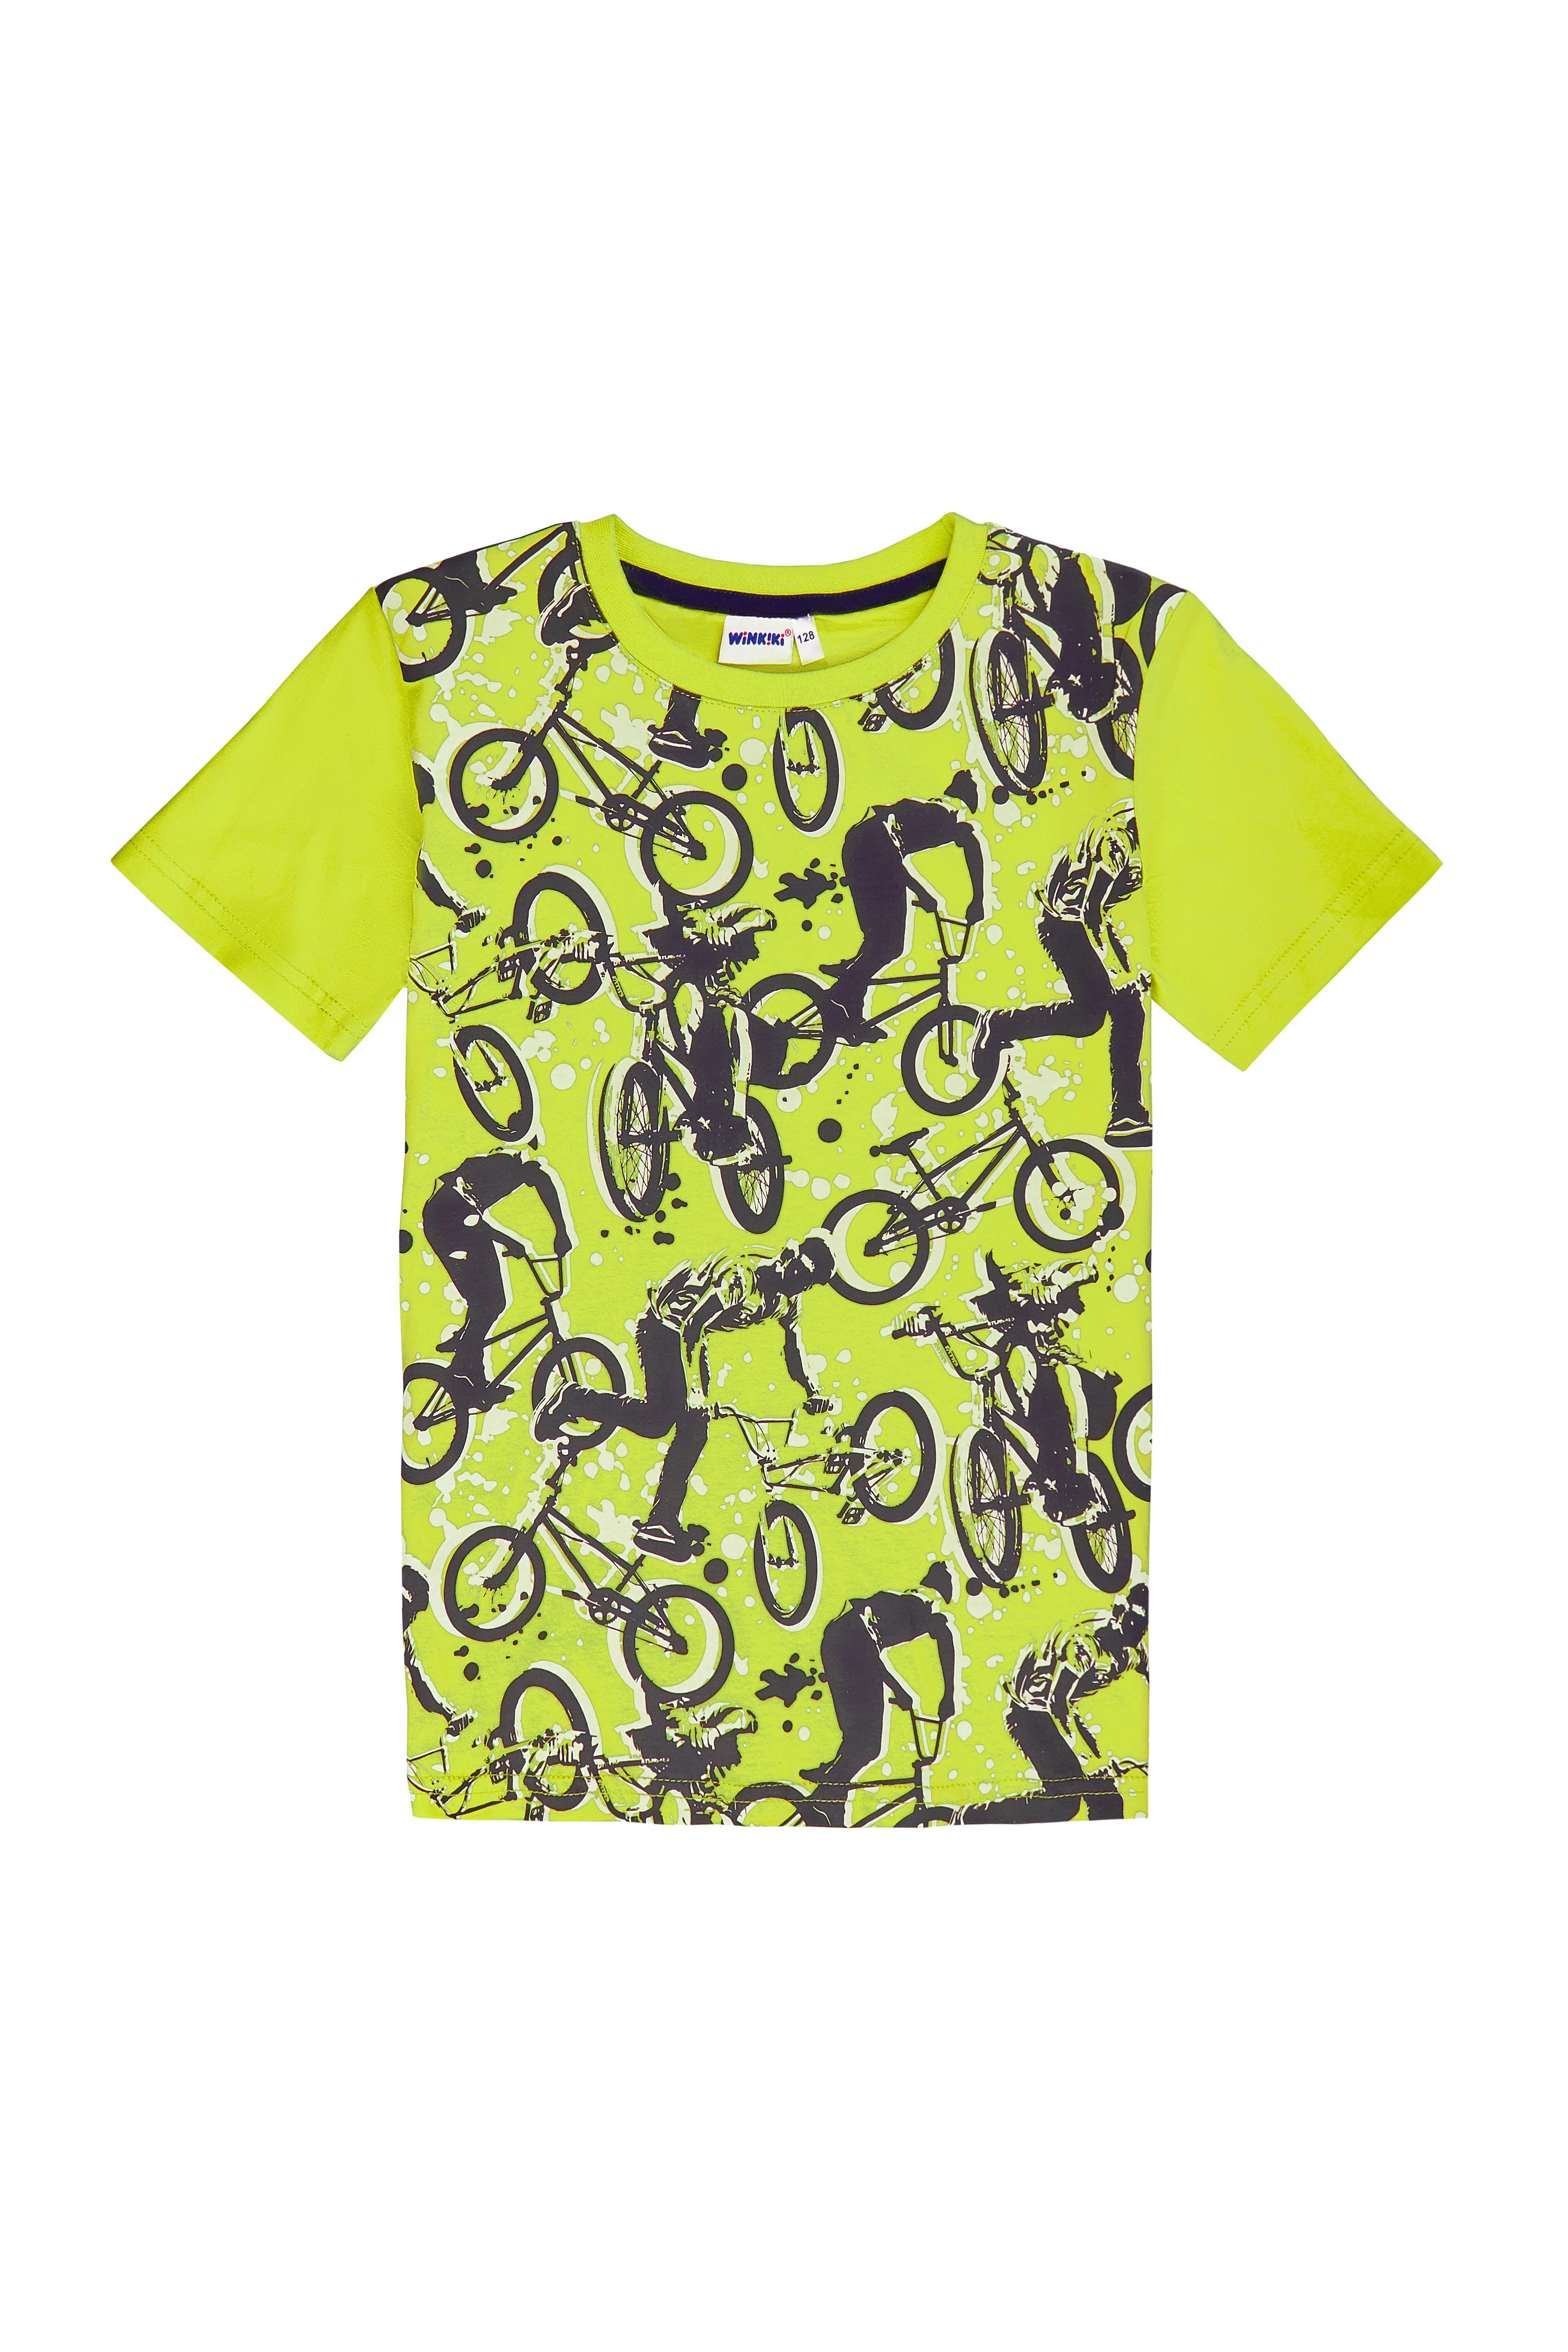 Chlapecké tričko Bikes - salátová Salátová